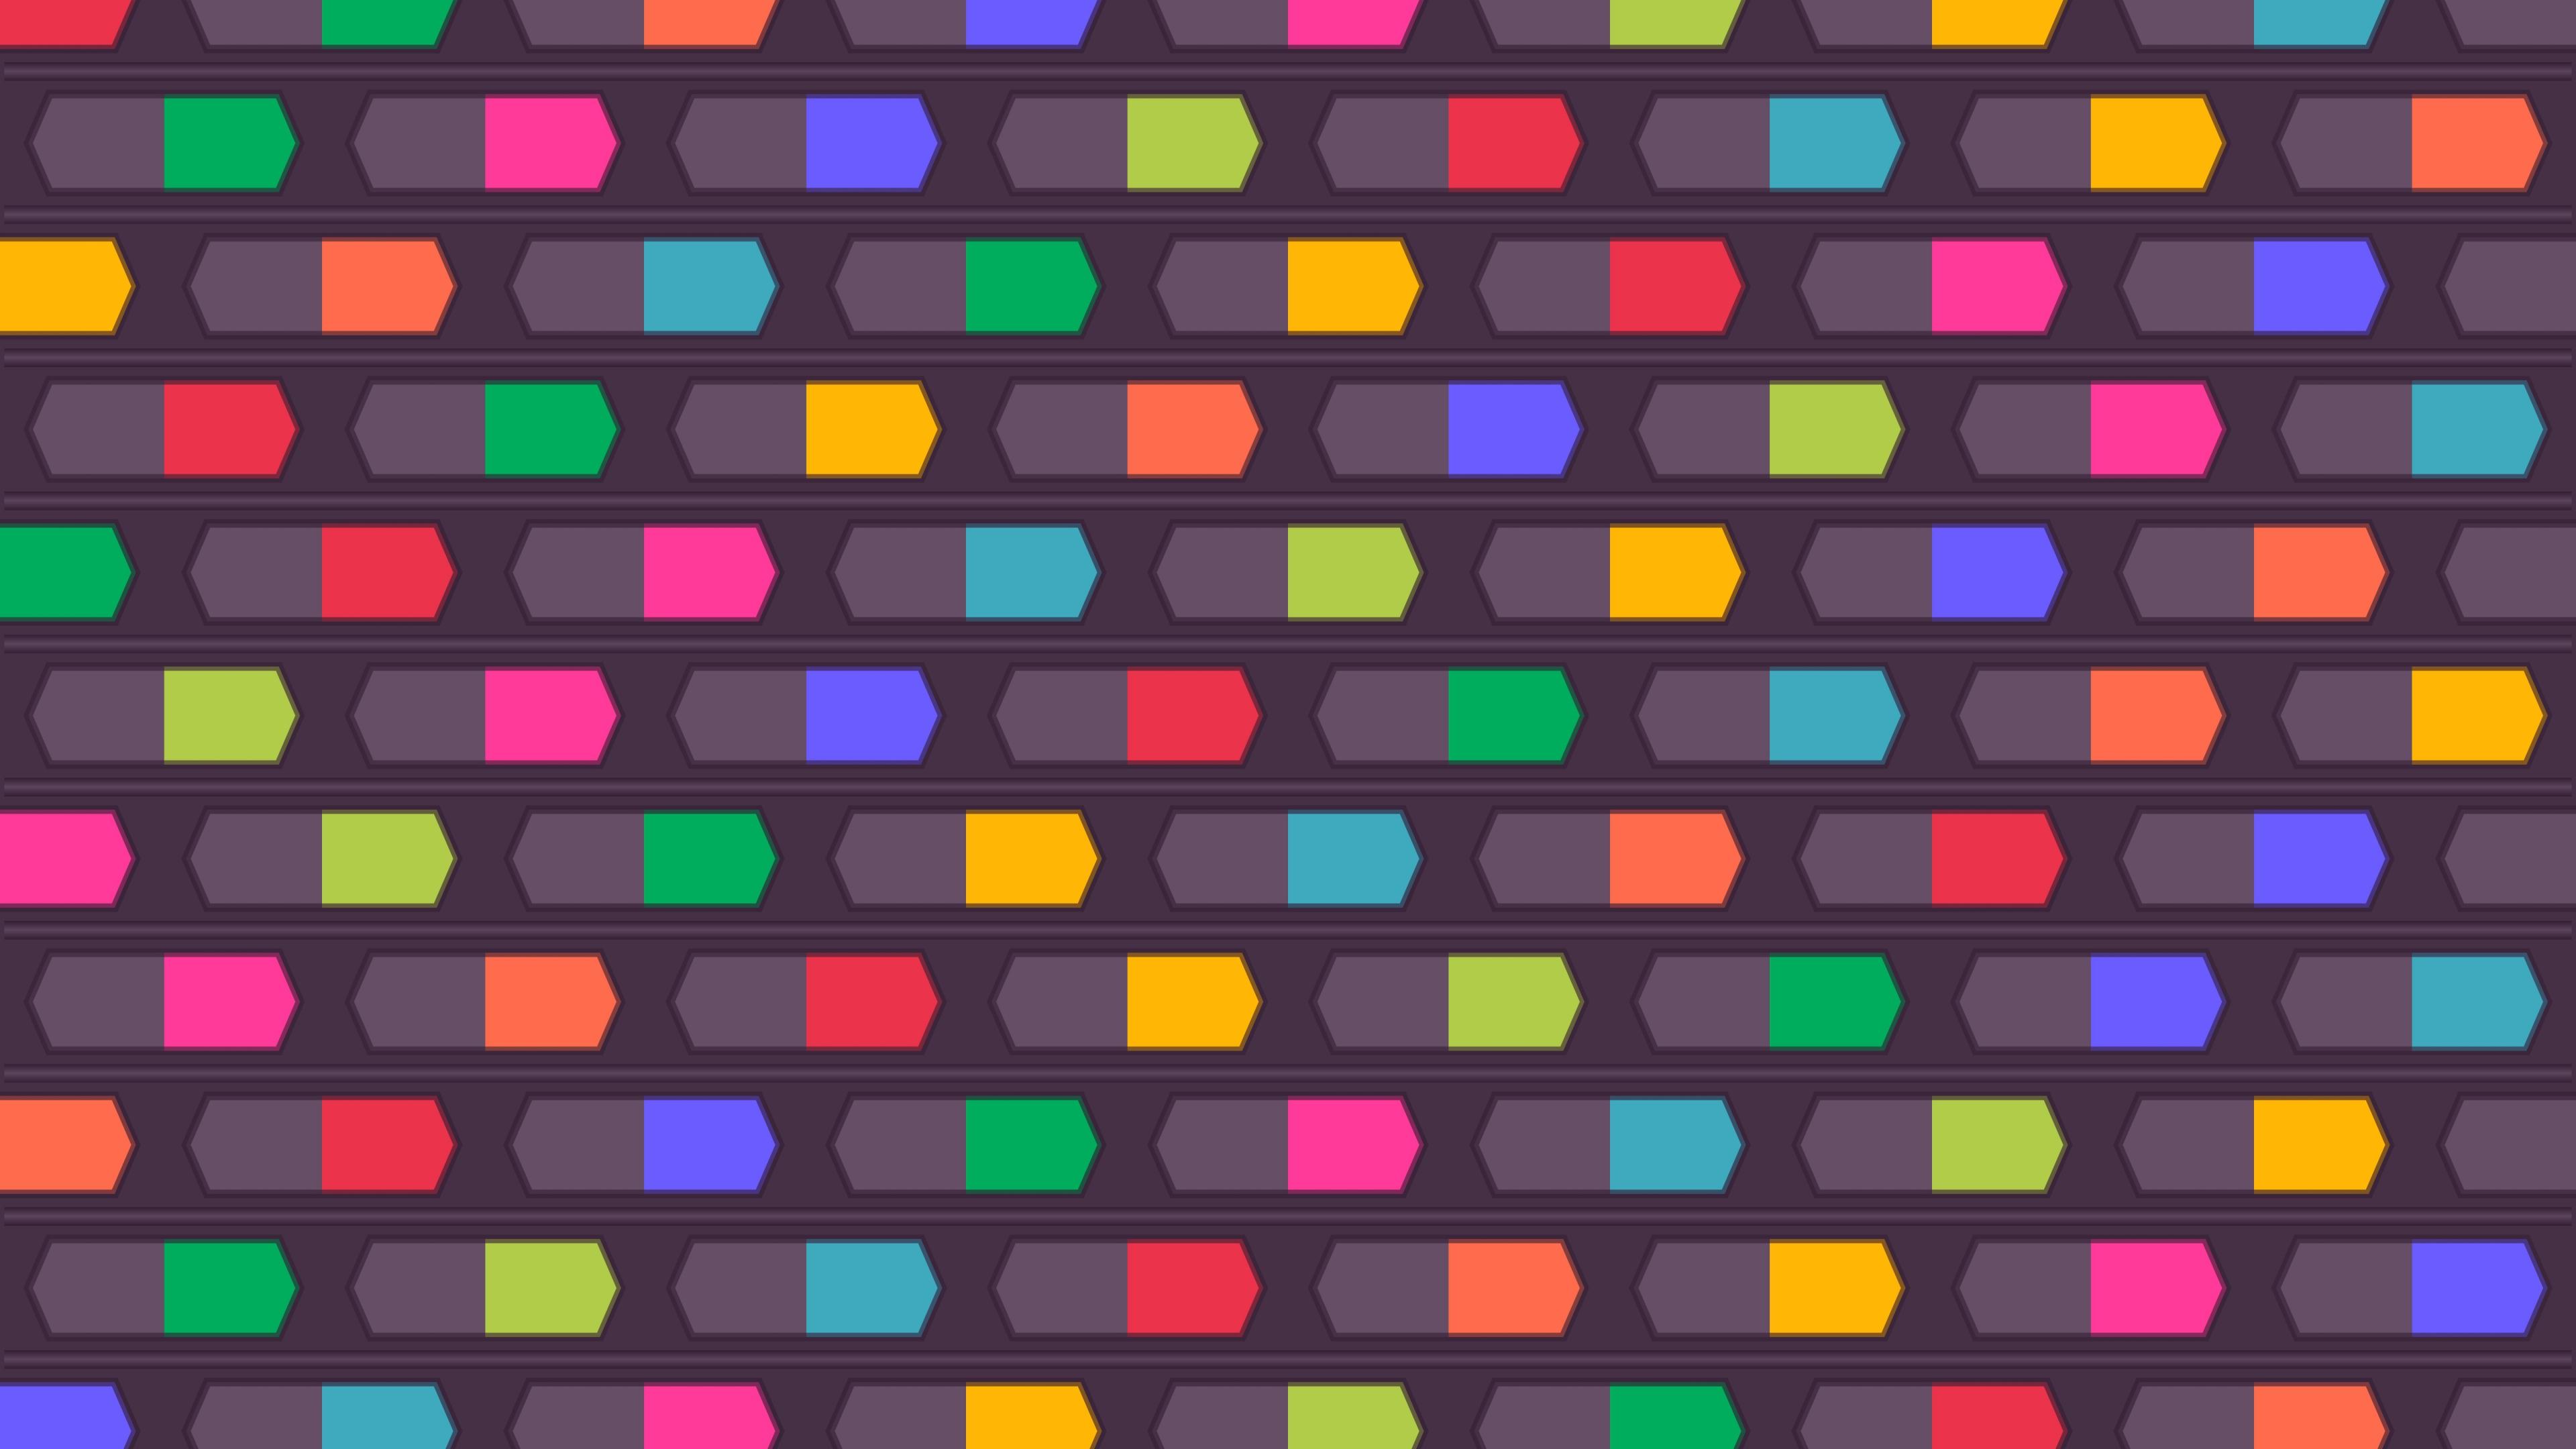 colorful texture shapes 1539370716 - Colorful Texture Shapes - texture wallpapers, colorful wallpapers, artist wallpapers, abstract wallpapers